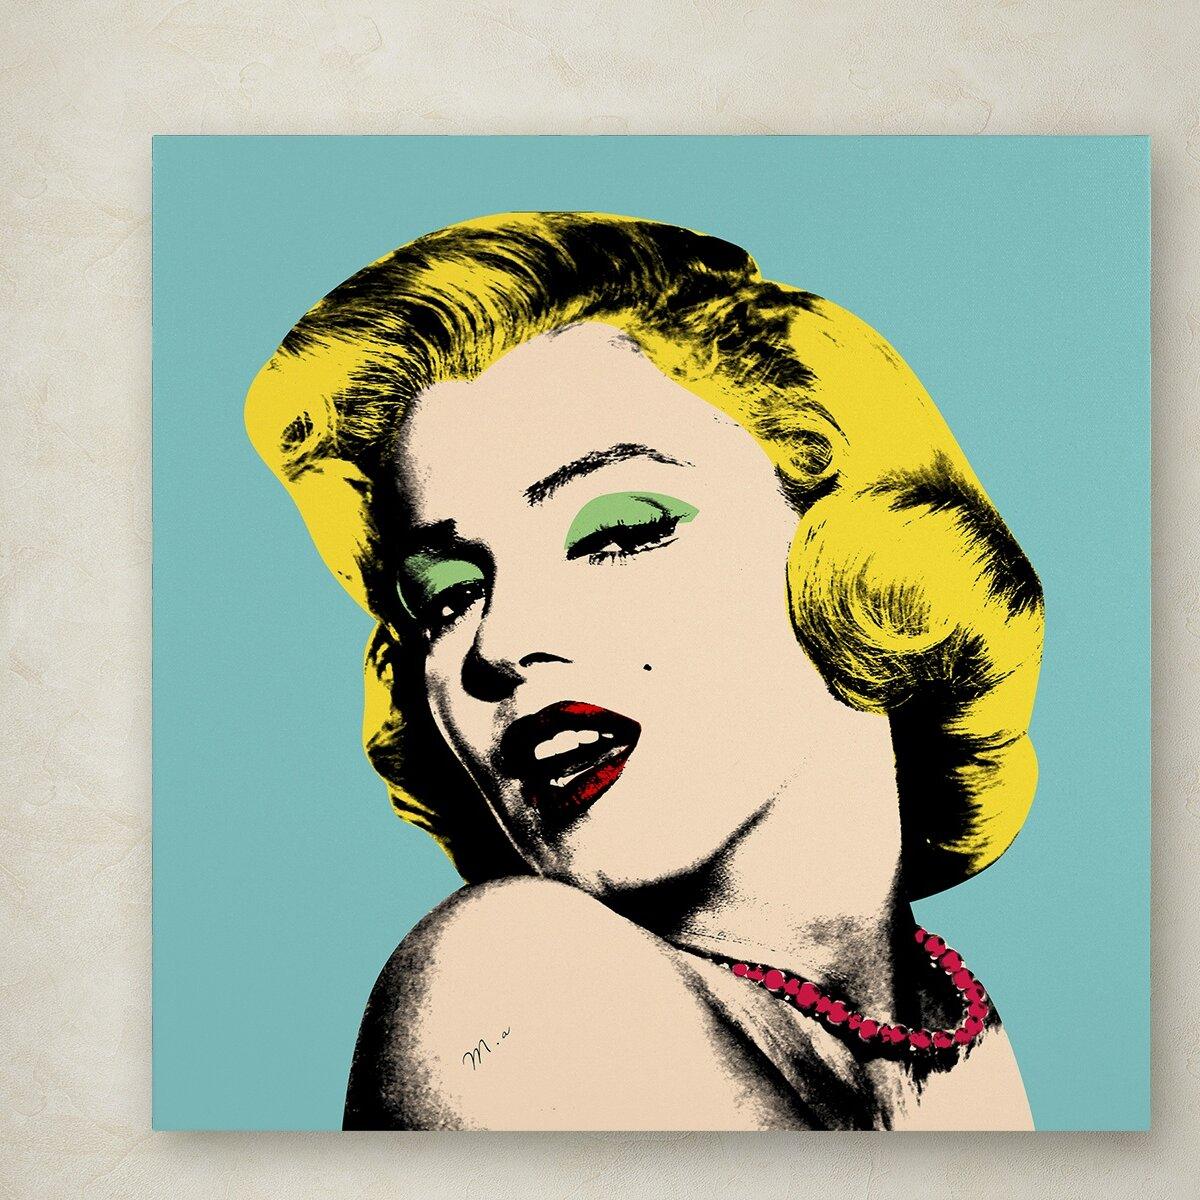 CANVAS Audrey Hepburn Girly Splash Gallery Wrapped Art by Pop Art Queen